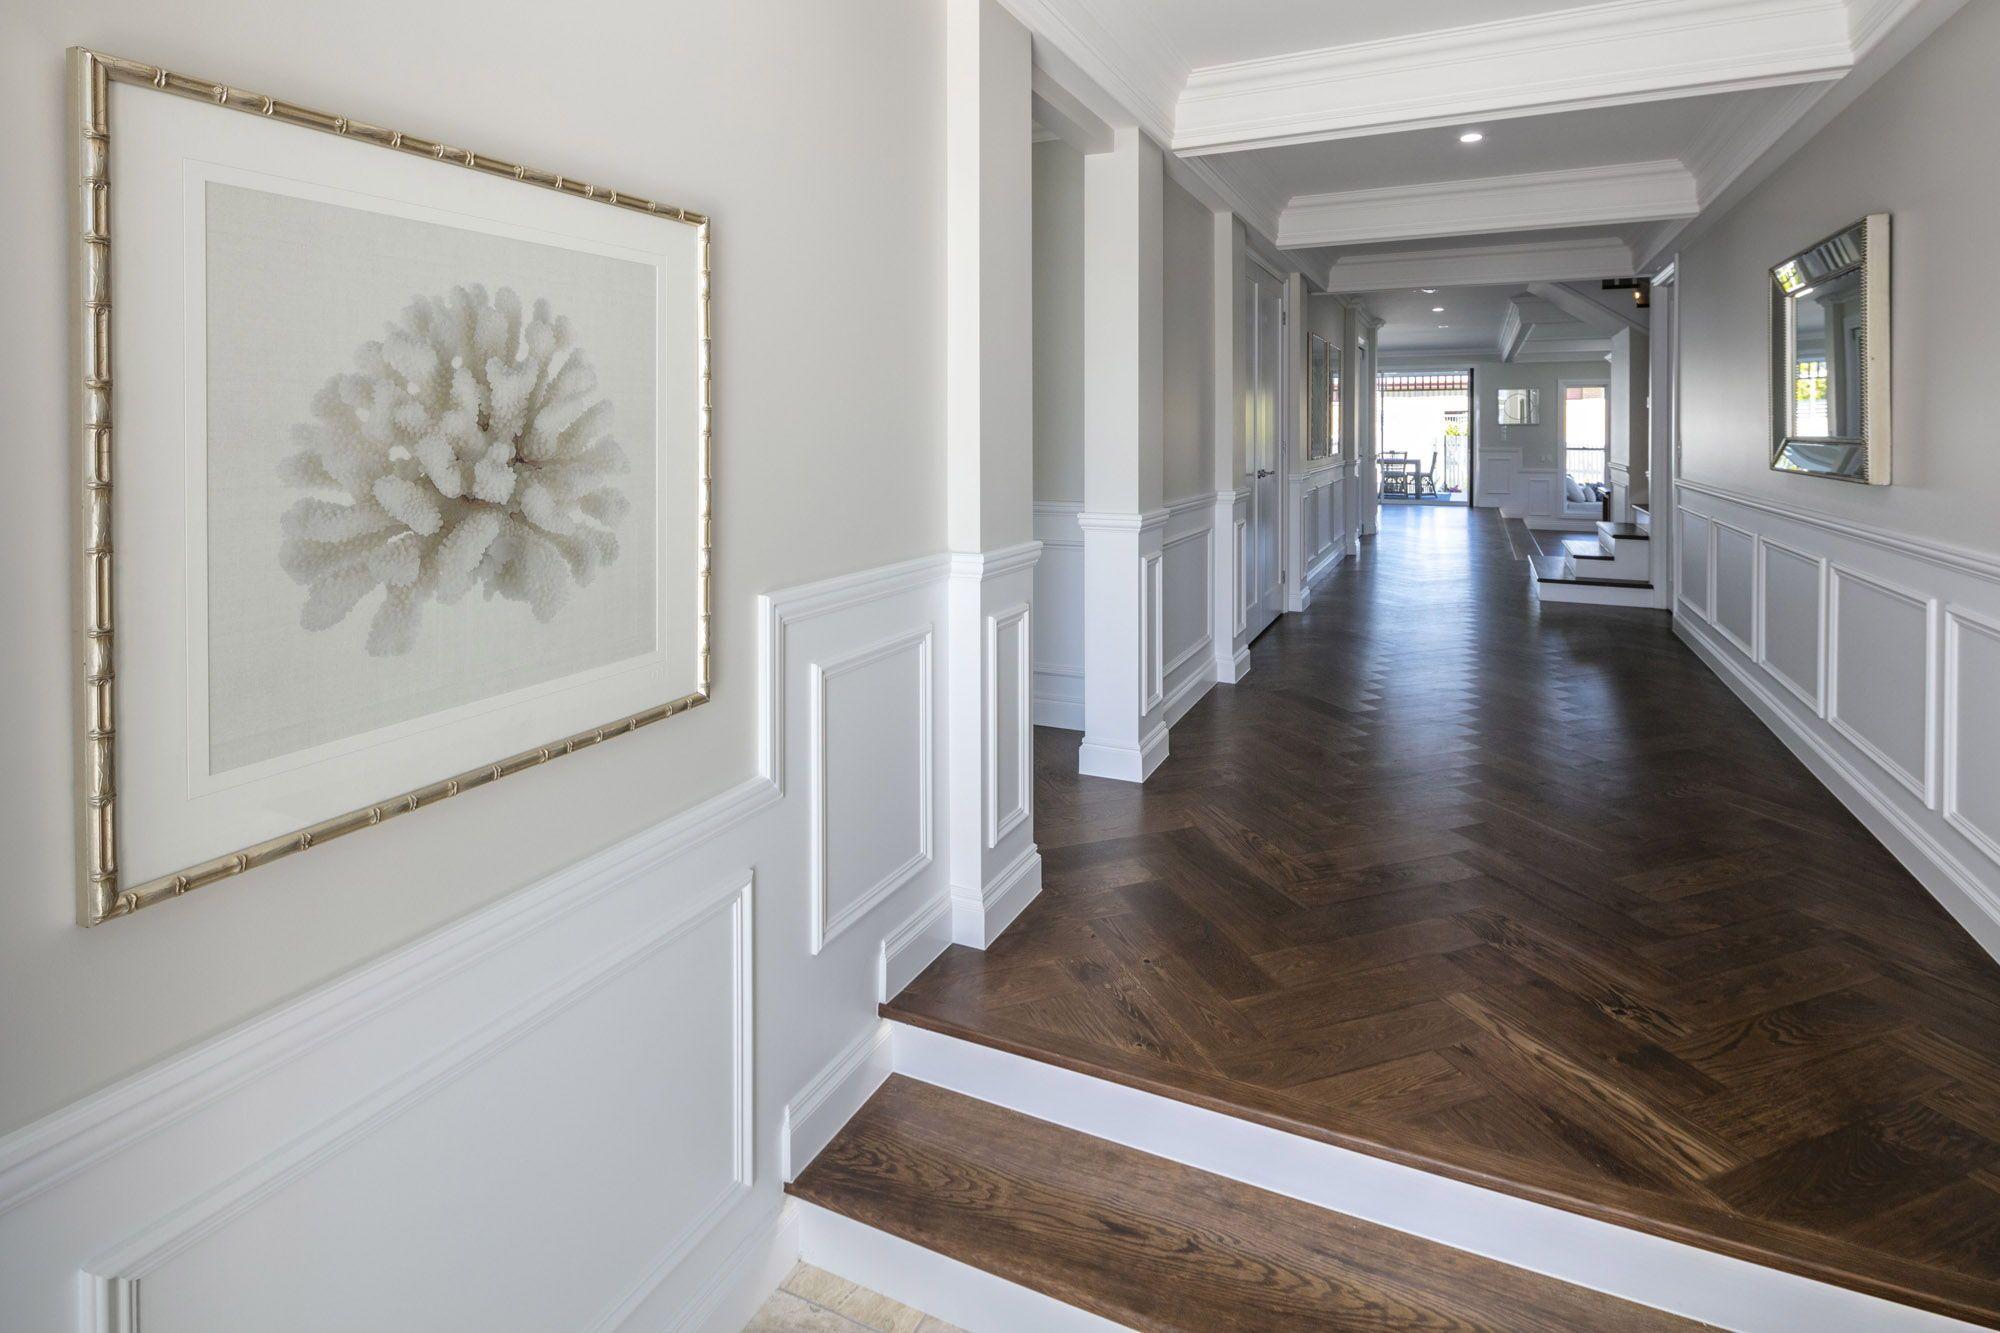 Sunken Floors Natural Timber Neutral Colours Wainscoting An